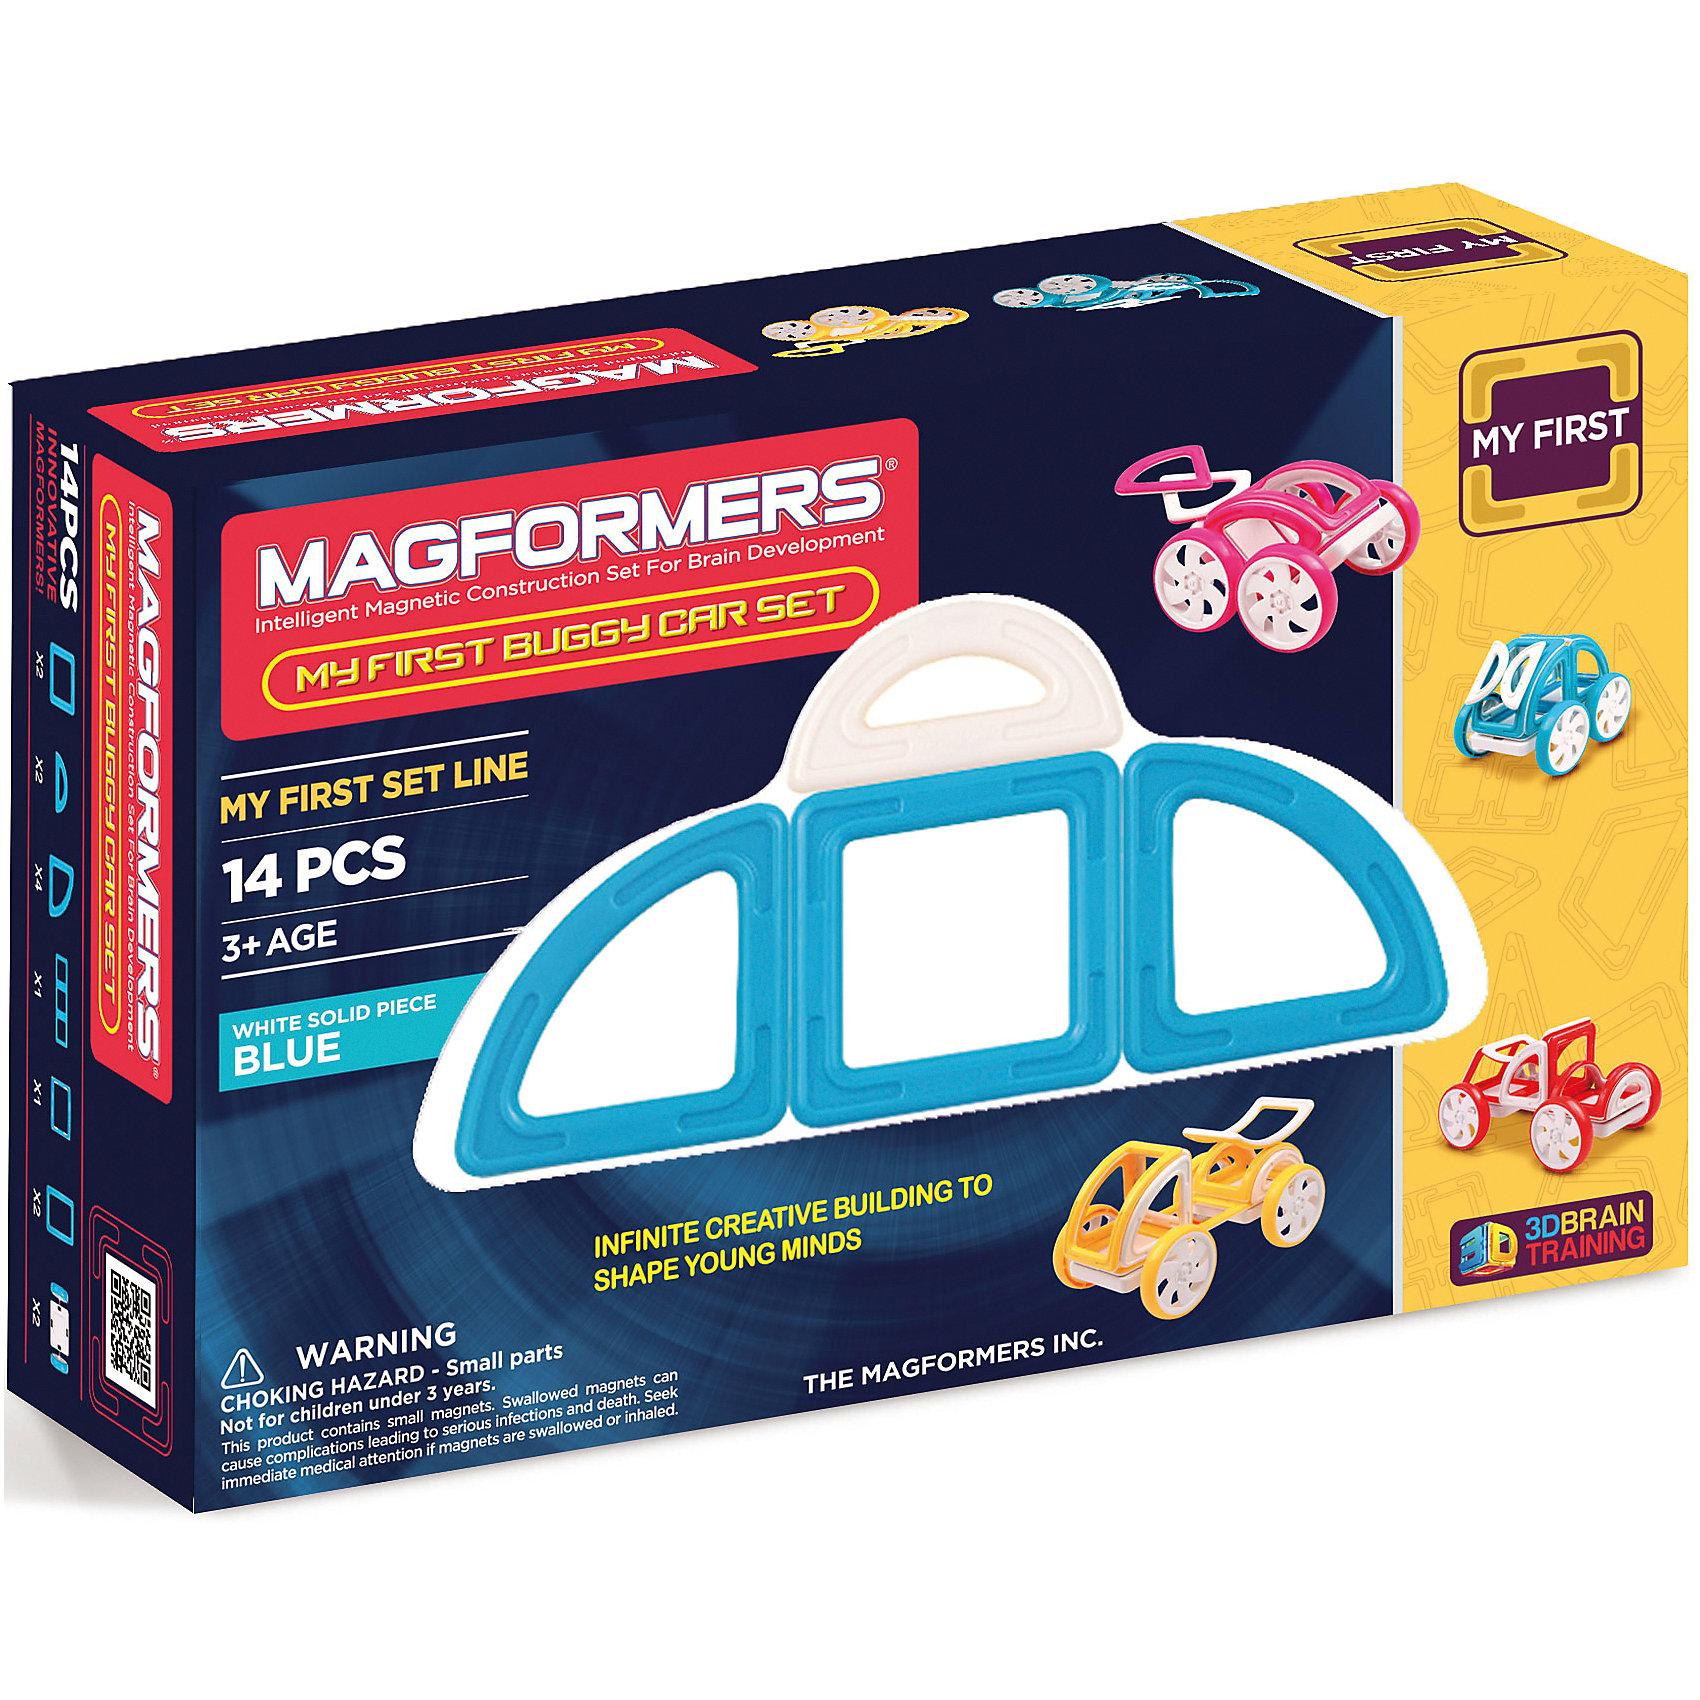 MAGFORMERS Магнитный конструктор My First Buggy, желтый, MAGFORMERS magformers магнитный конструктор xl cruiser set цвет красный желтый